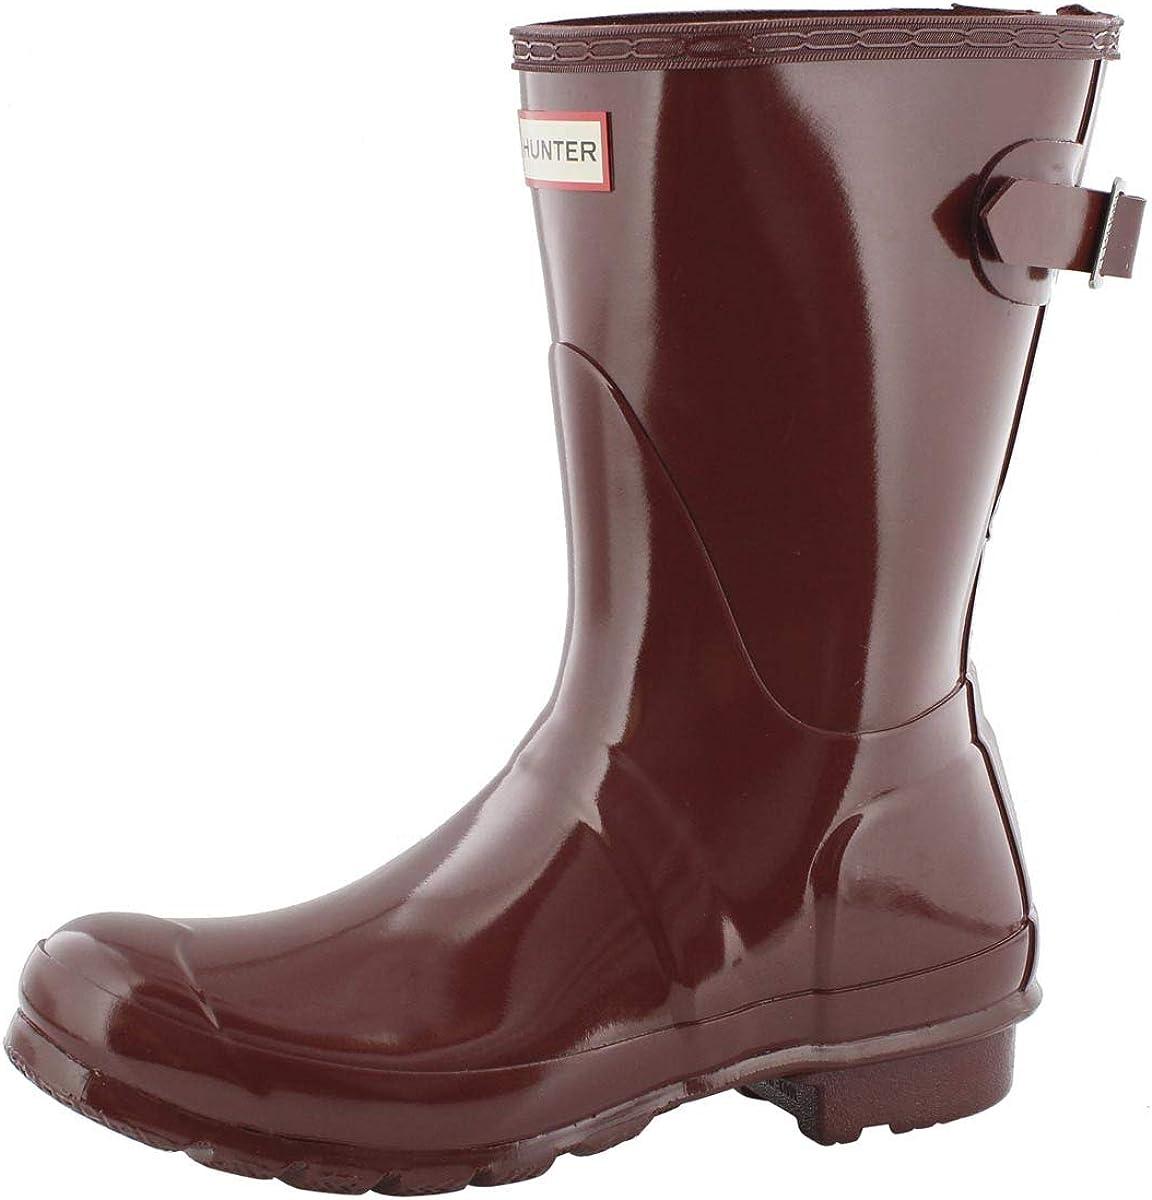 Hunter Boots Womens Original Back Adjustable Gloss Short Rain Boot Rmblng Red 7 Medium US